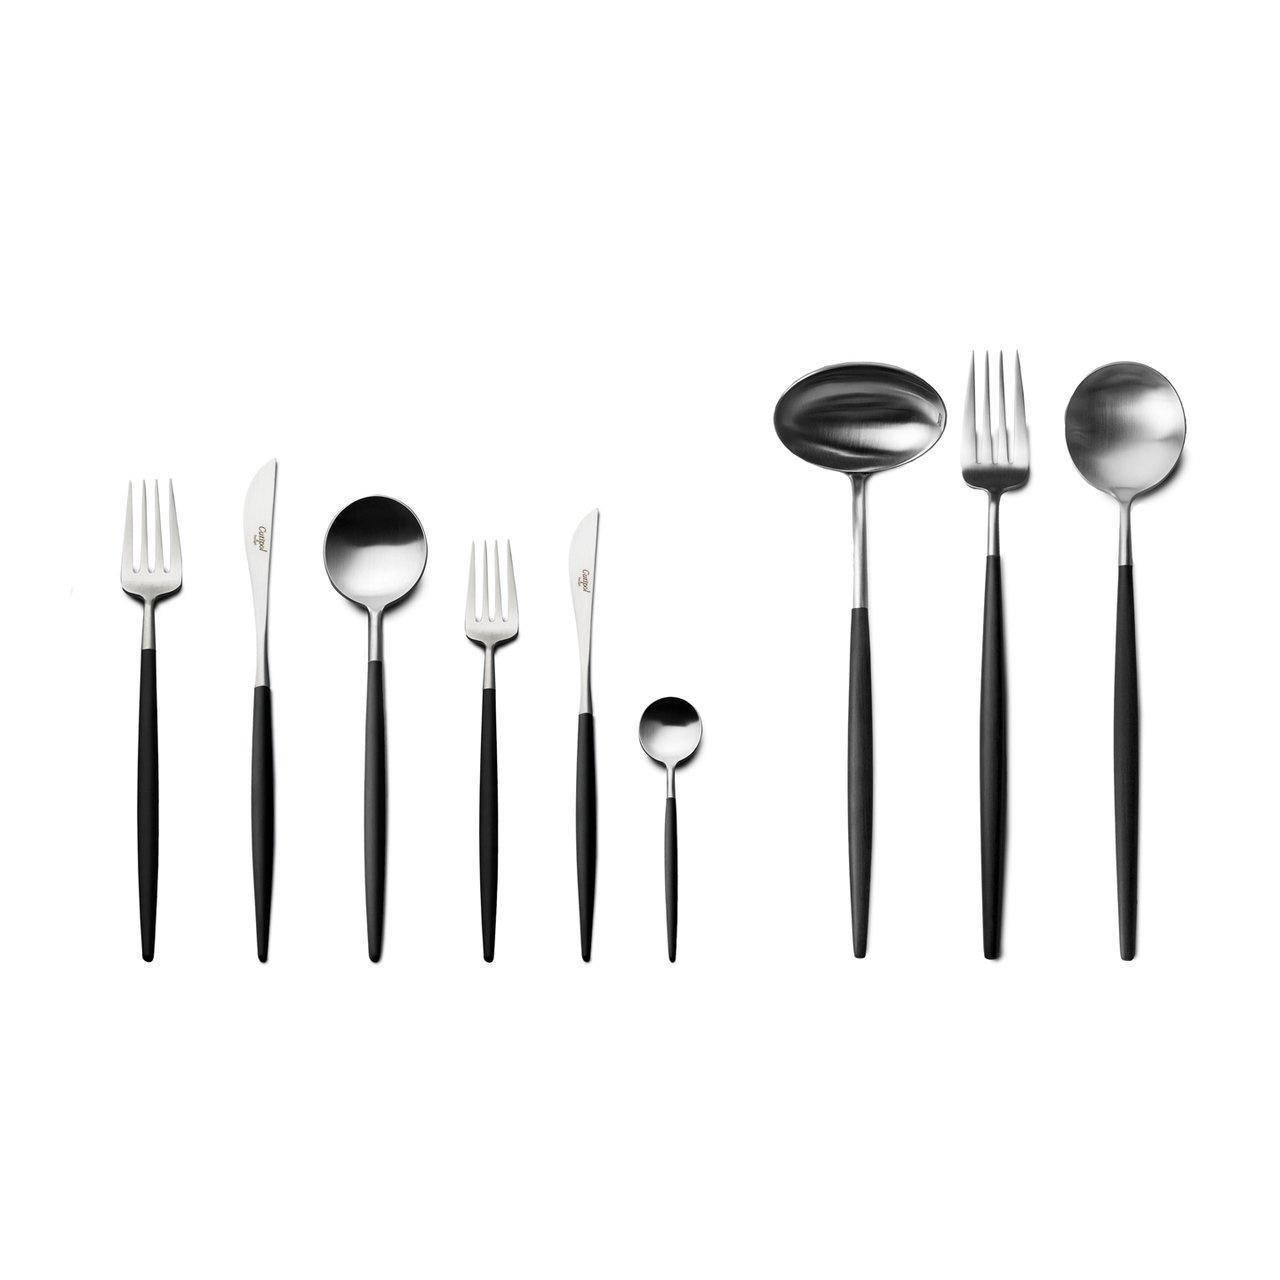 CUTIPOL - Goa Cutlery 75 pcs Black/ Inox-1